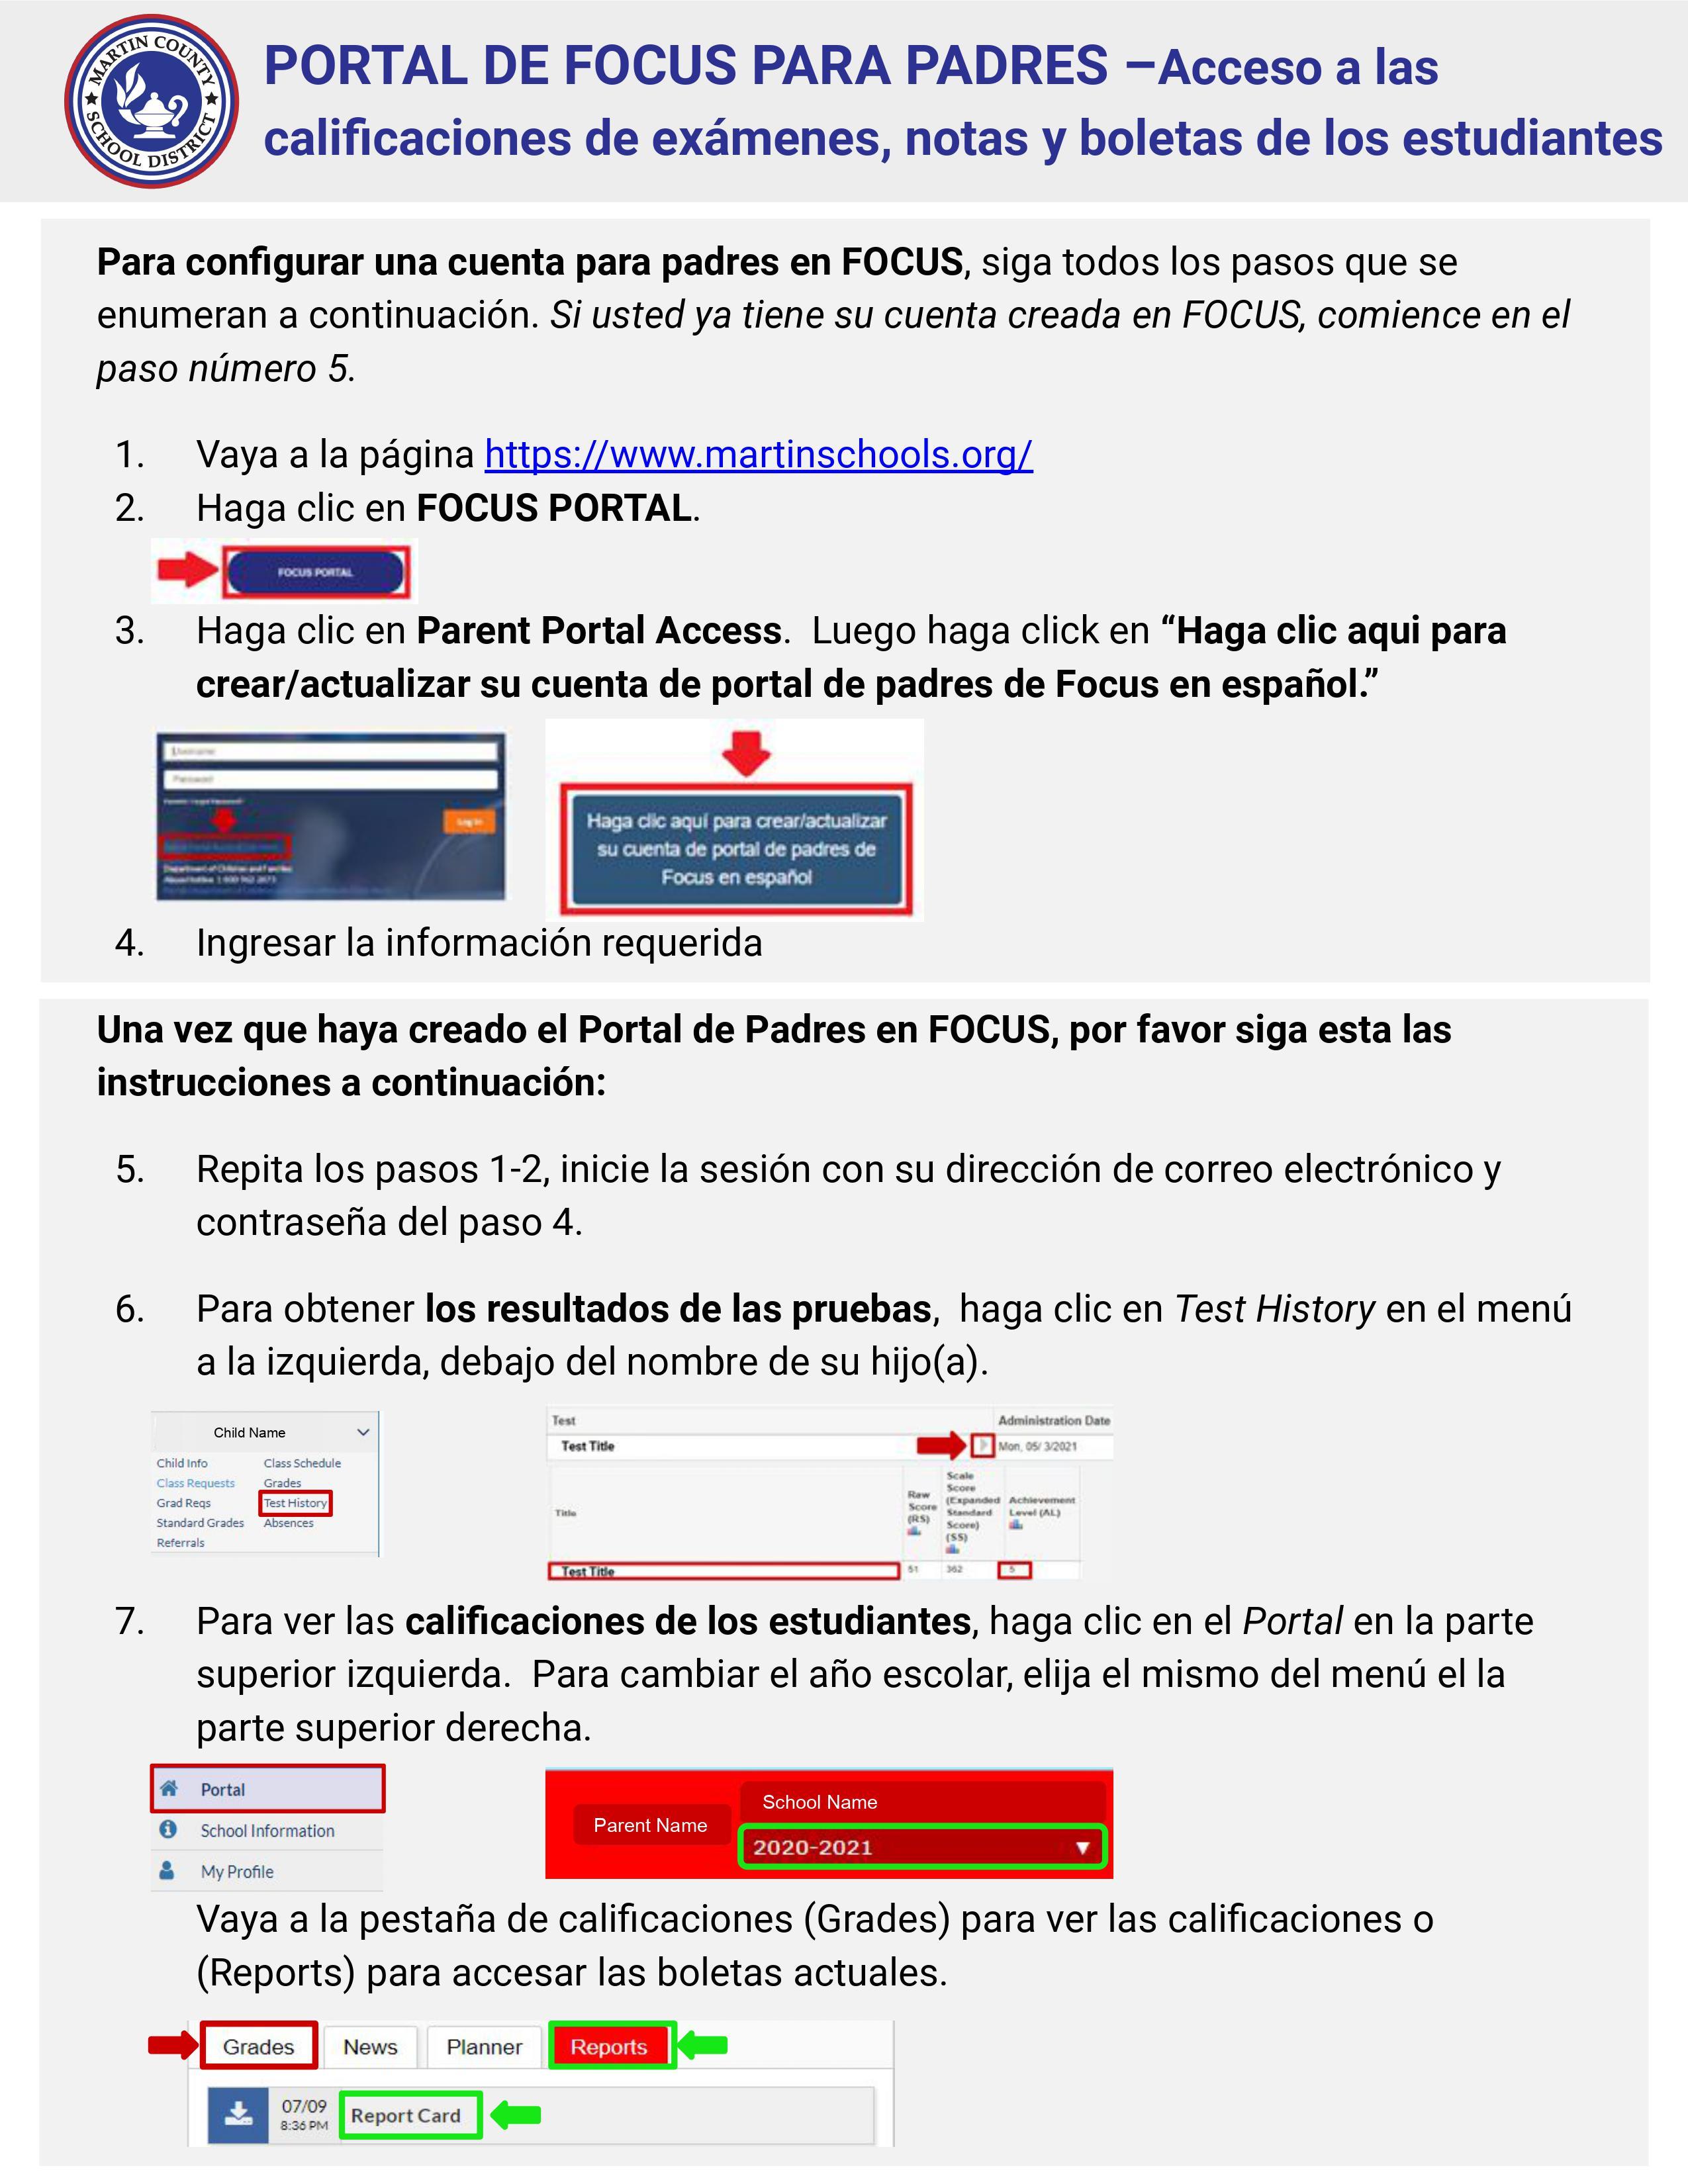 FOCUS Parent Portal Instructions - Spanish